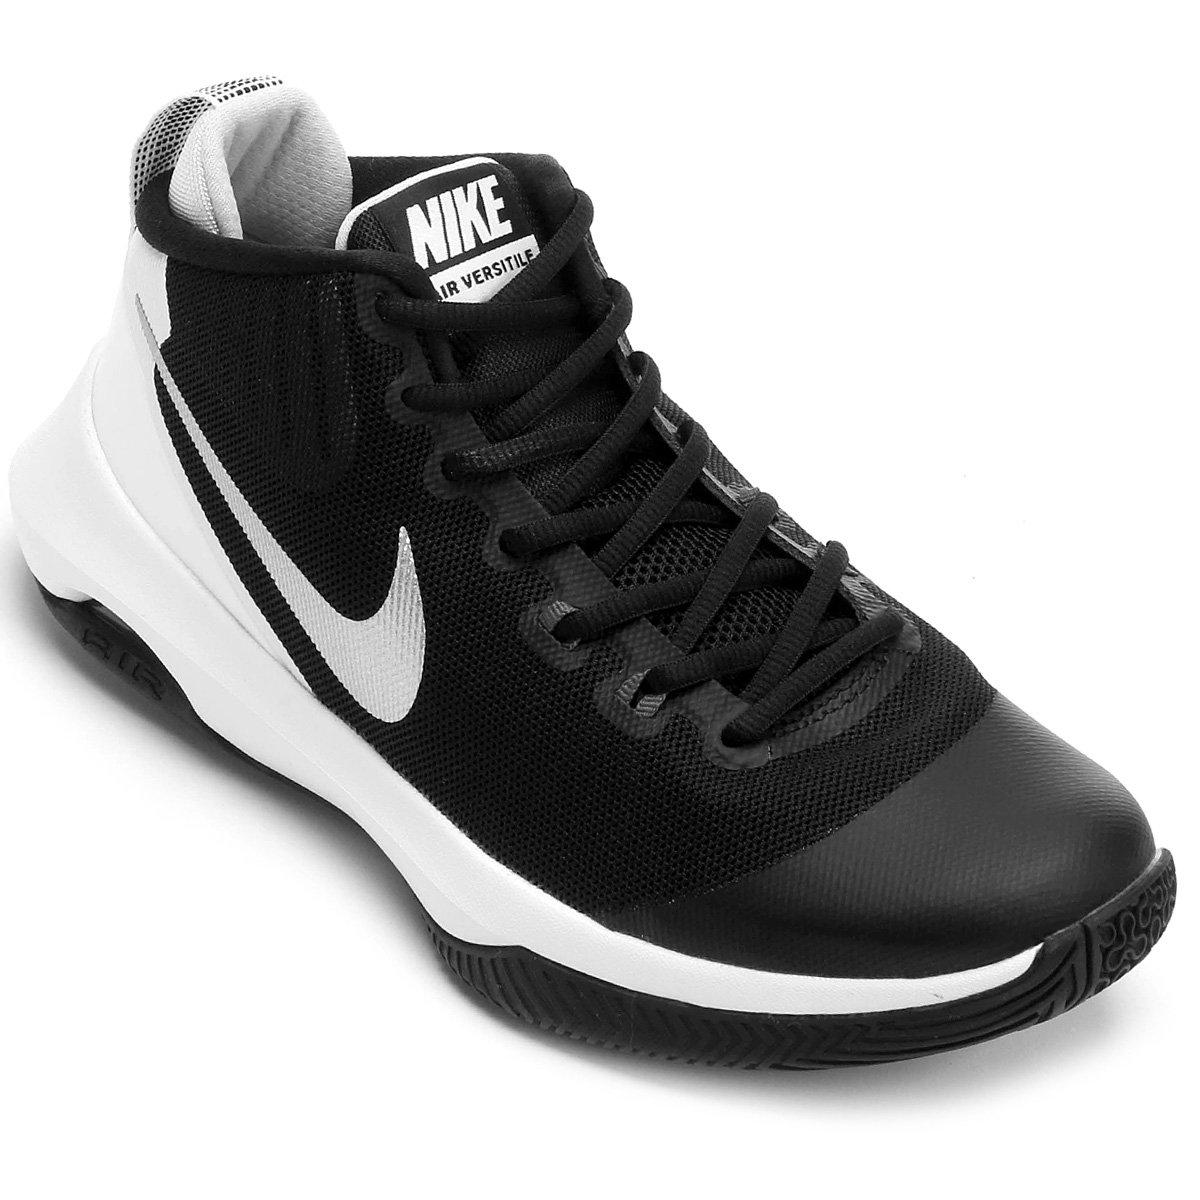 f2b4472ee9e8 Tênis Nike Air Versitile Masculino - Preto e Cinza - Compre Agora ...